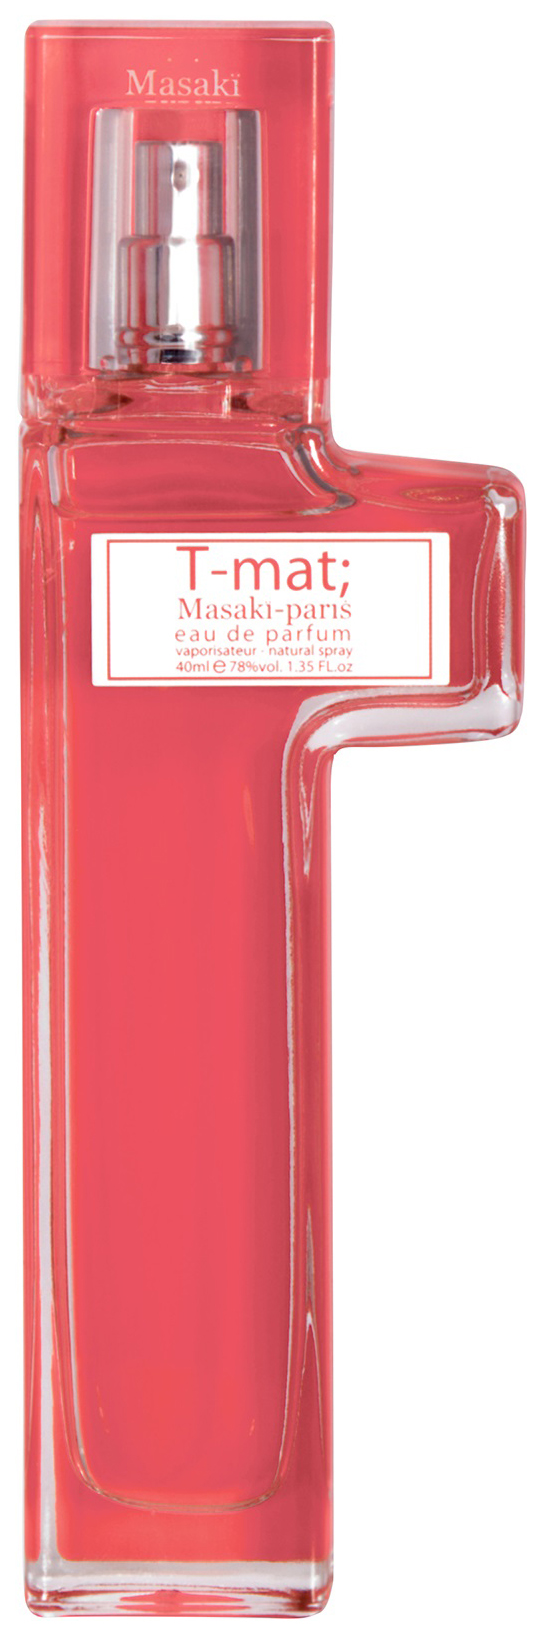 Парфюмерная вода Masaki Matsushima T-mat 80 мл